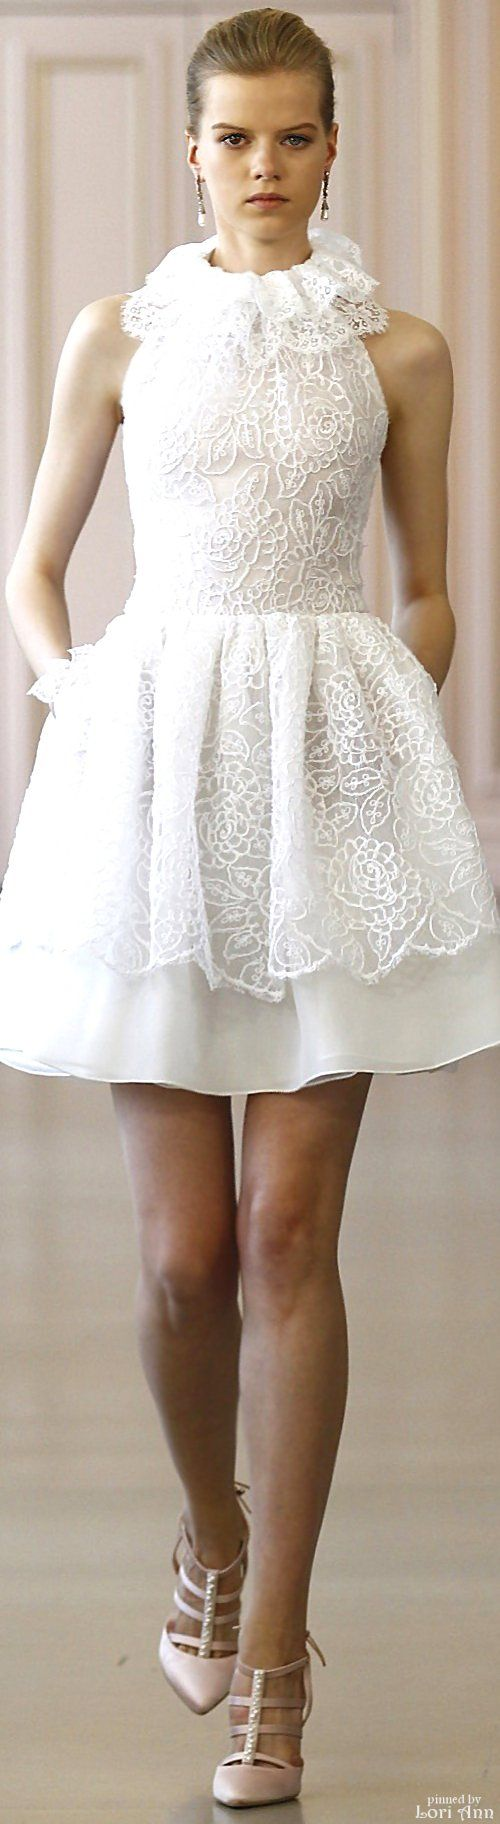 vestido noiva oscar de la renta 5